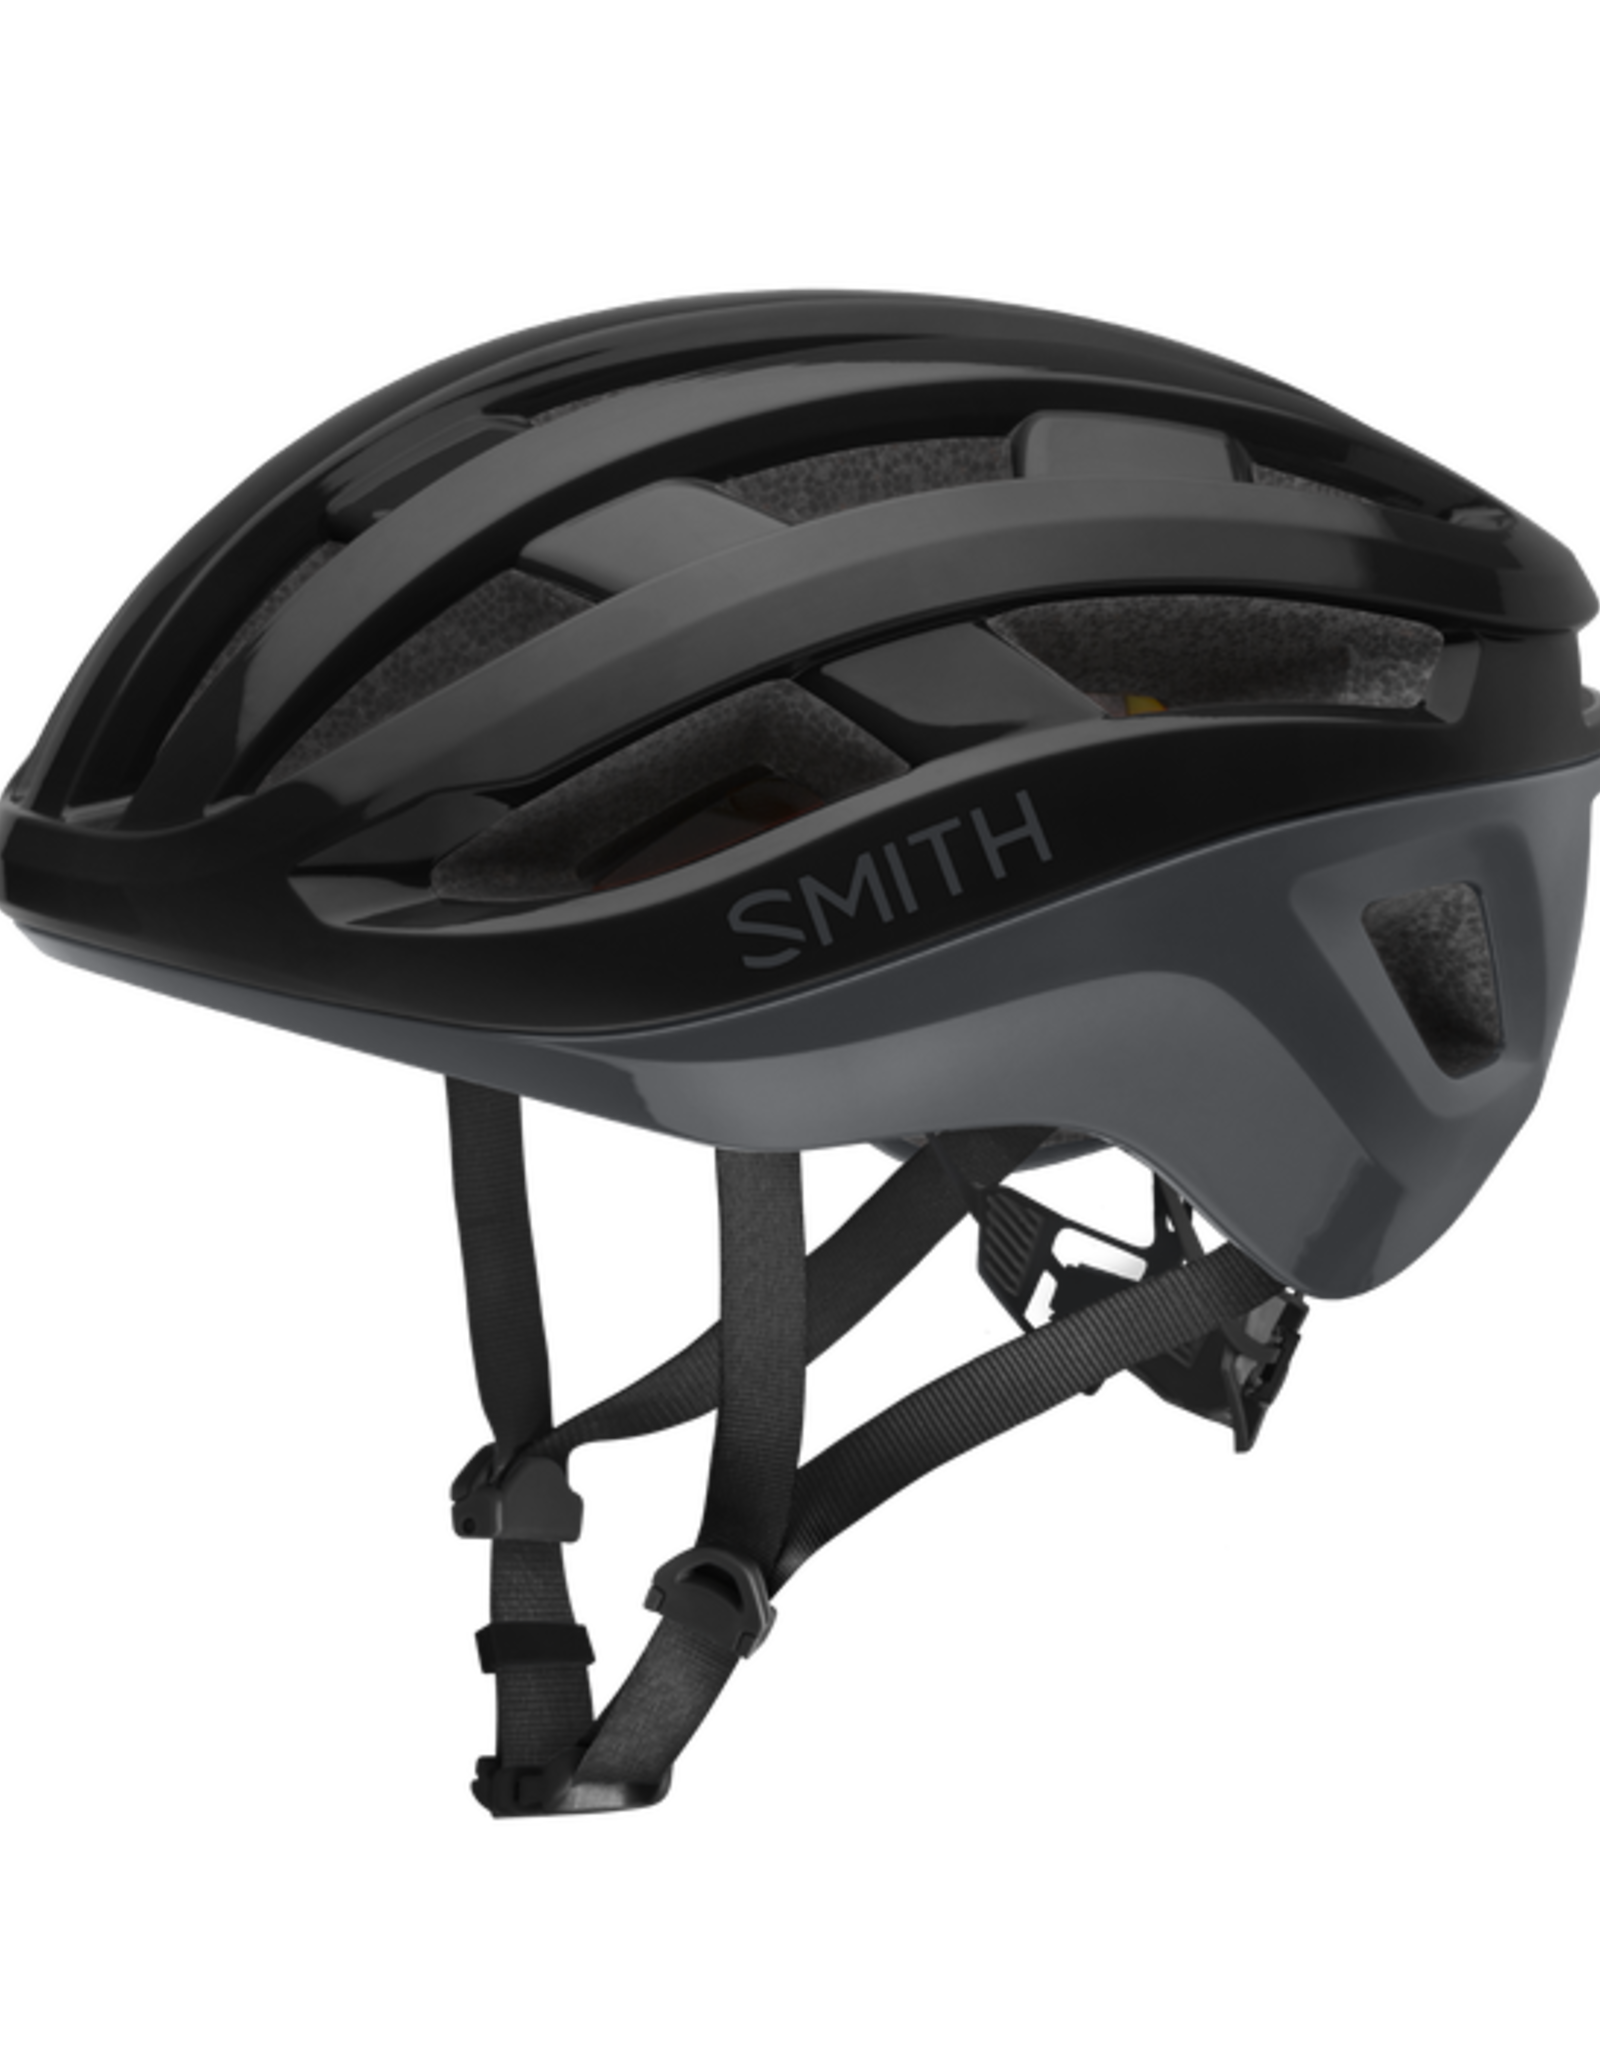 SMITH OPTICS SMITH Bike Helmet PERSIST MIPS